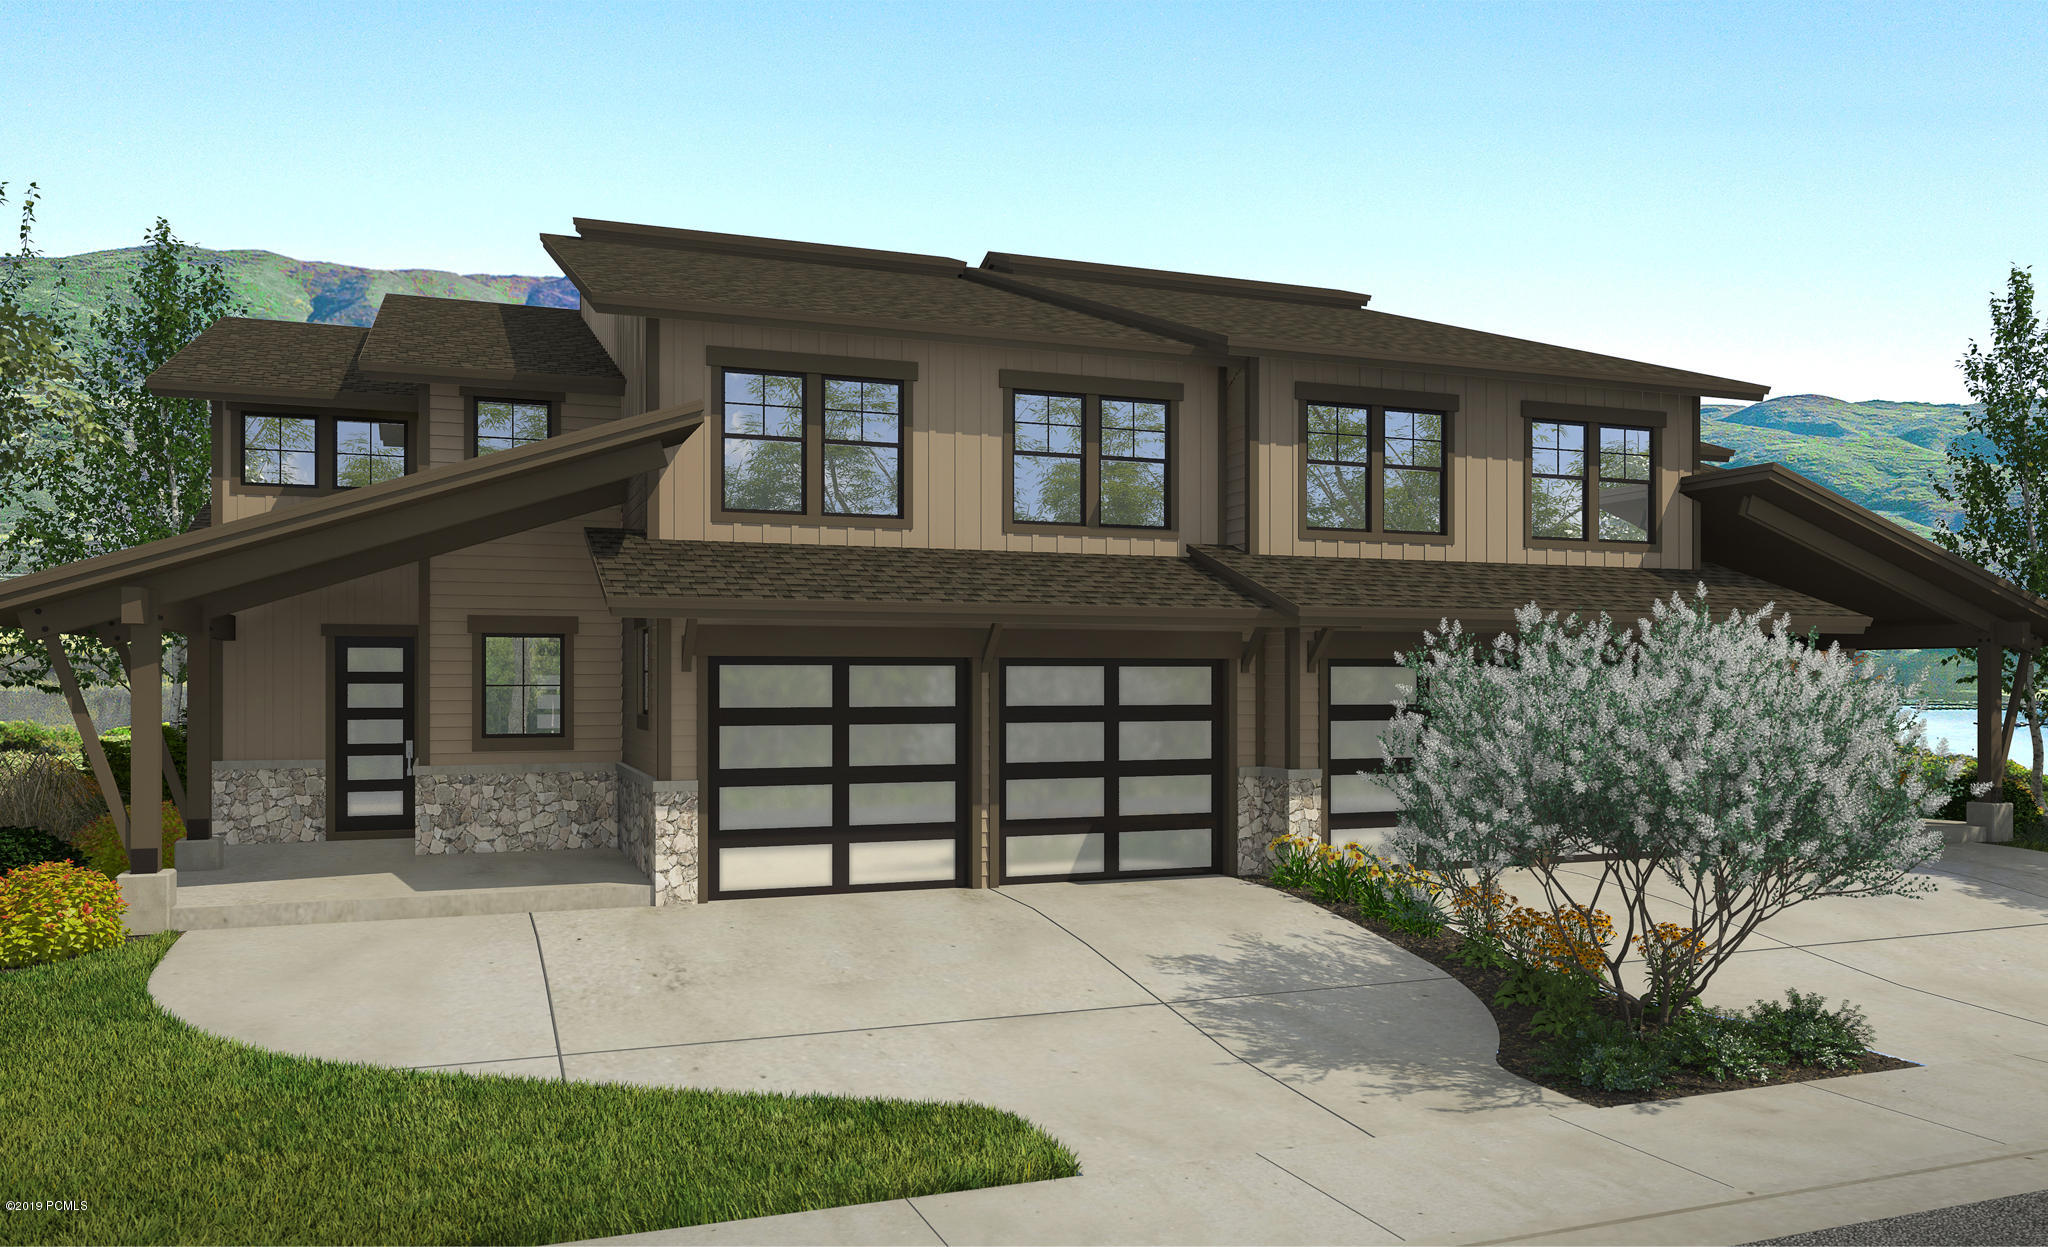 10058 Meer Circle, Heber City, Utah 84032, 4 Bedrooms Bedrooms, ,4 BathroomsBathrooms,Condominium,For Sale,Meer,11908400